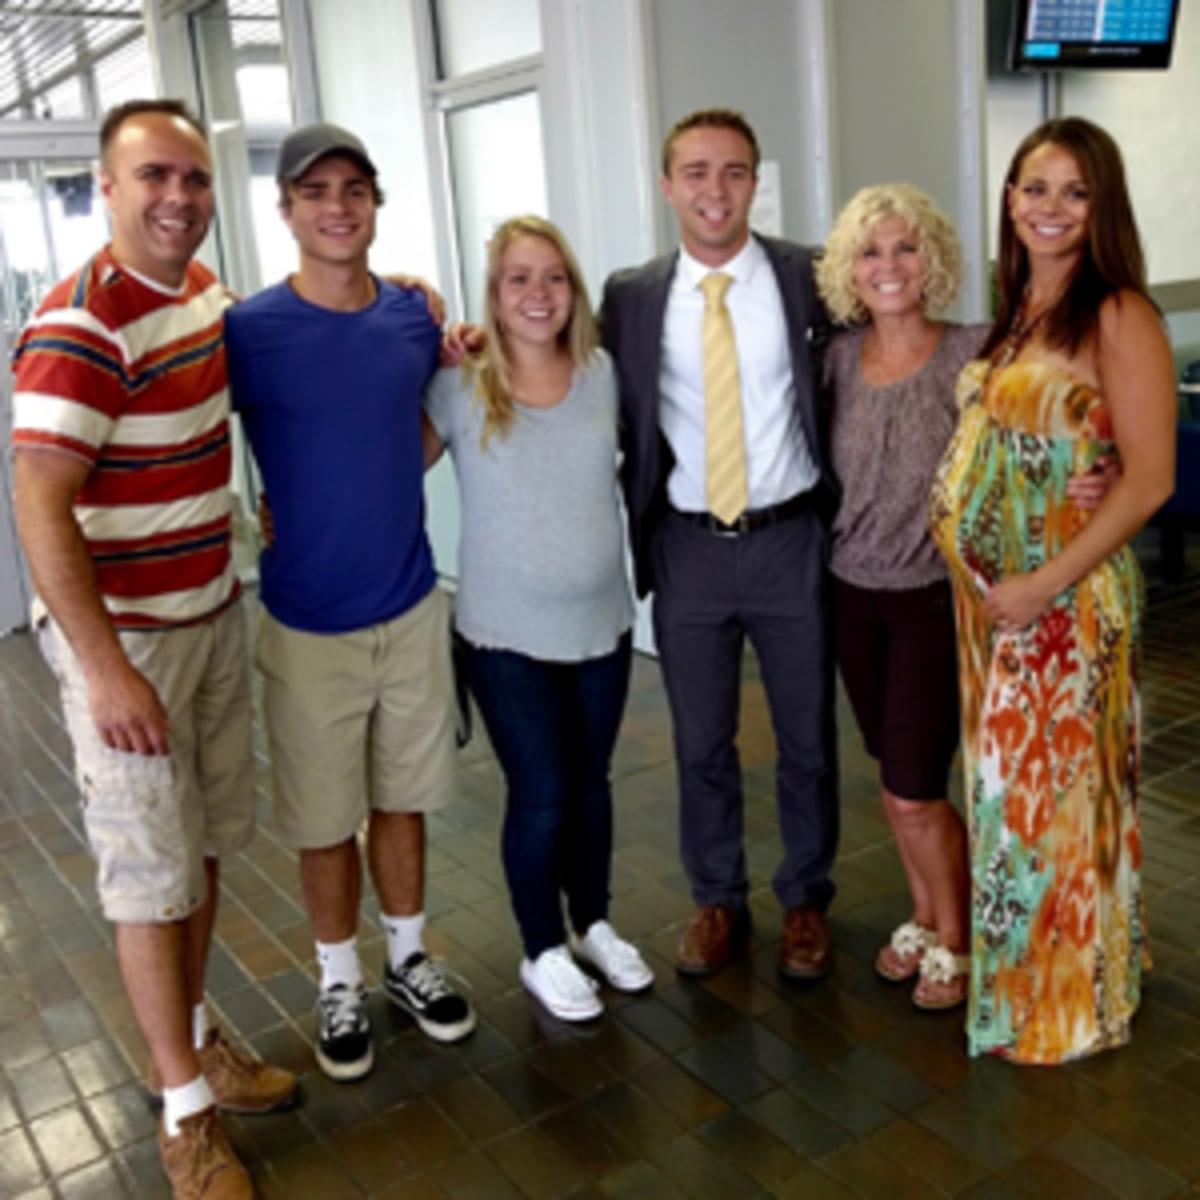 Jaxon Toly family